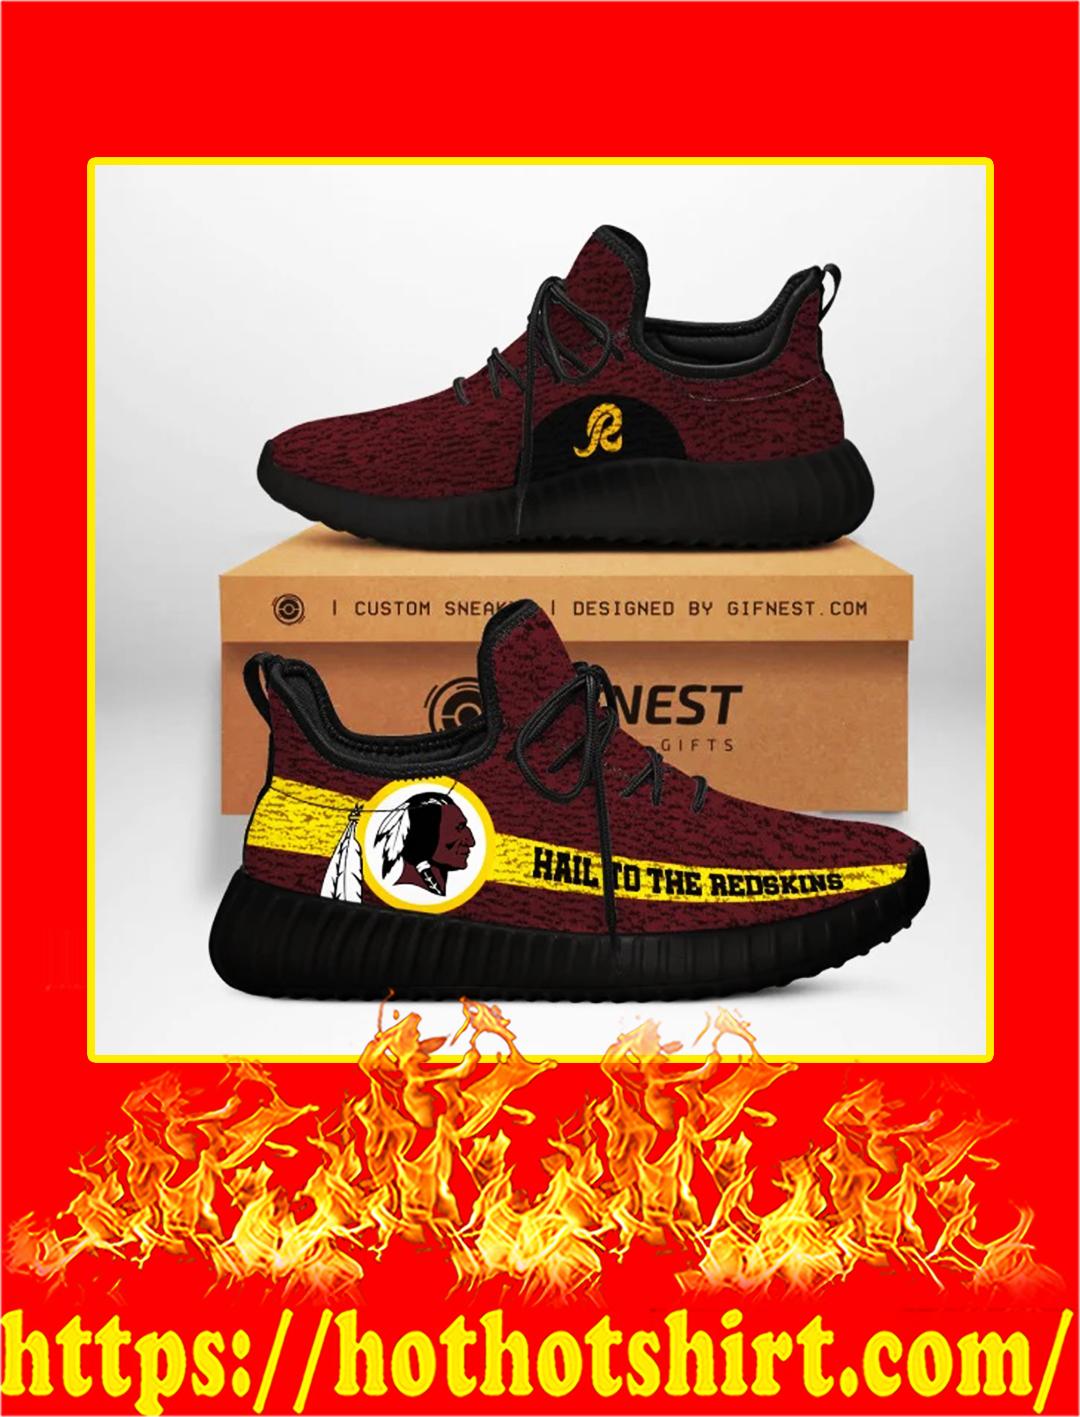 Hail To The Redskins Washington Redskins NFL Yeezy Sneaker